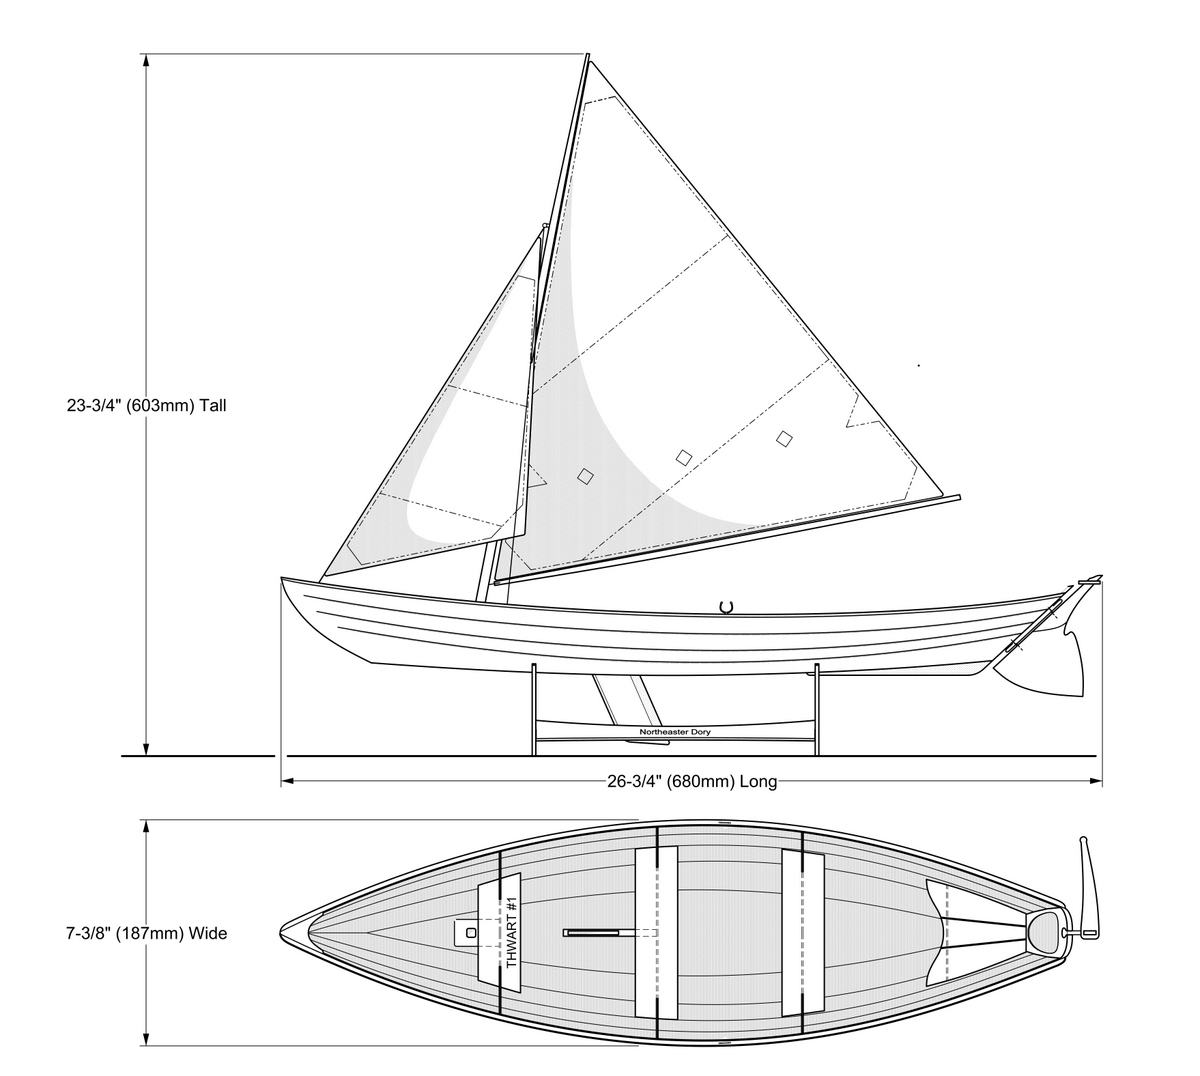 Northeaster Dory Scale Model Kit